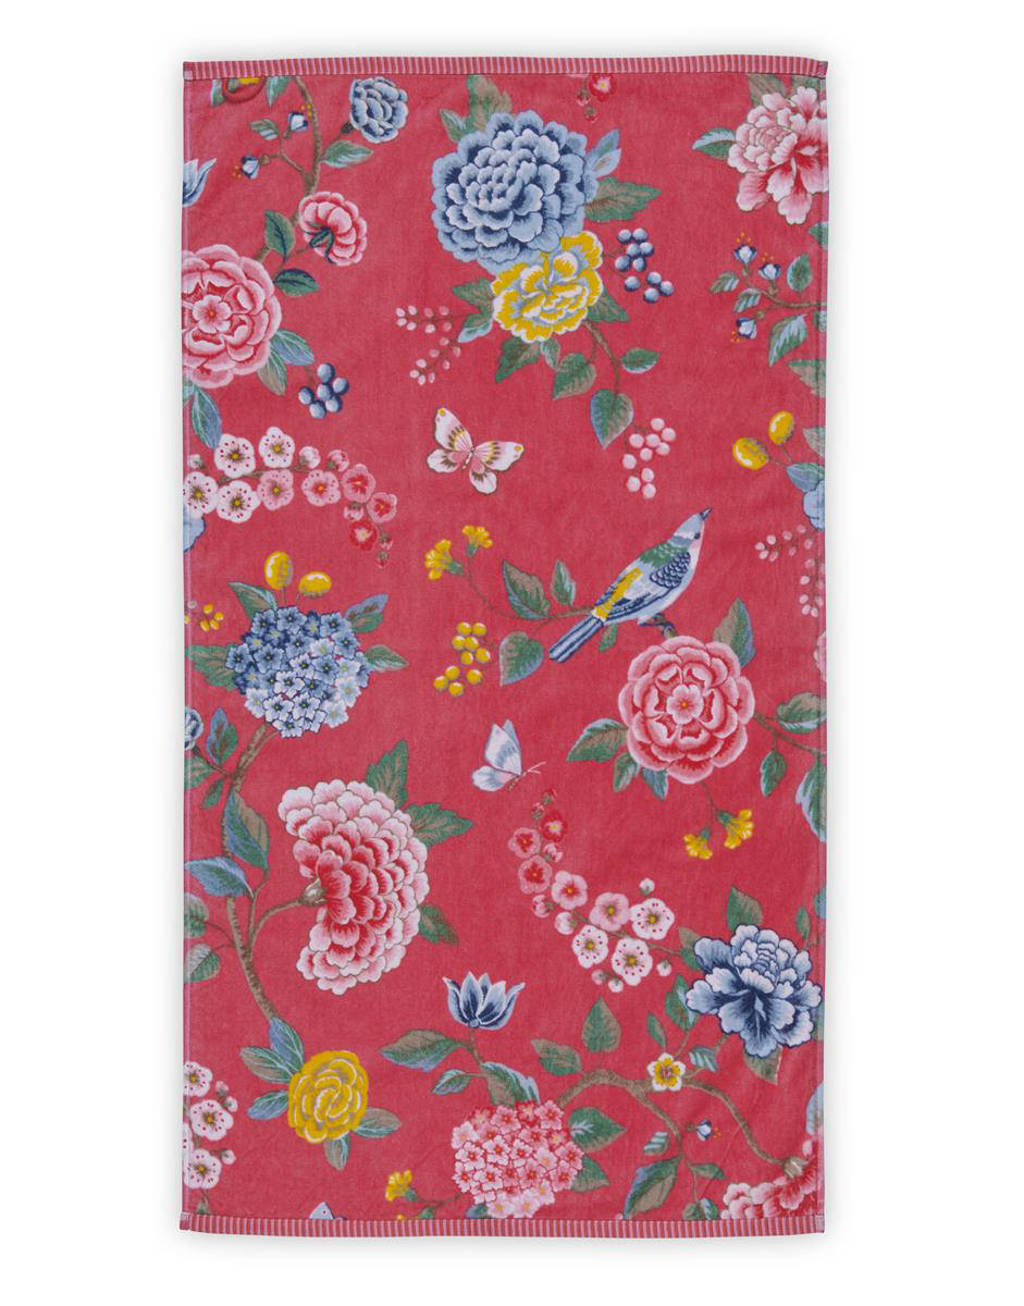 Pip Studio handdoek (100 x 55 cm) Koraalrood